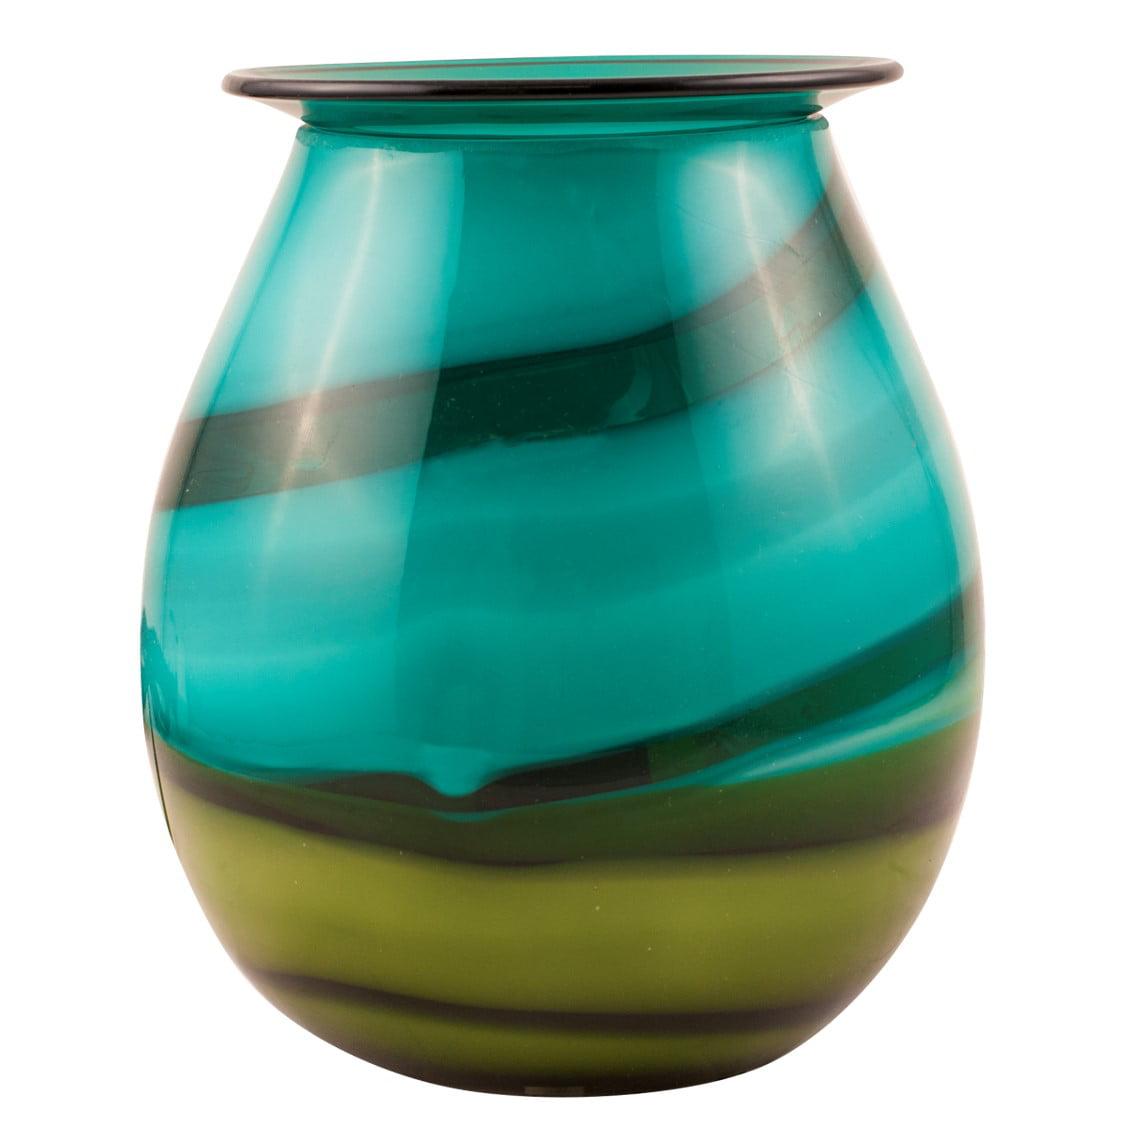 Better Homes & Gardens Marina Art Glass Full-Size Scented Wax Warmer